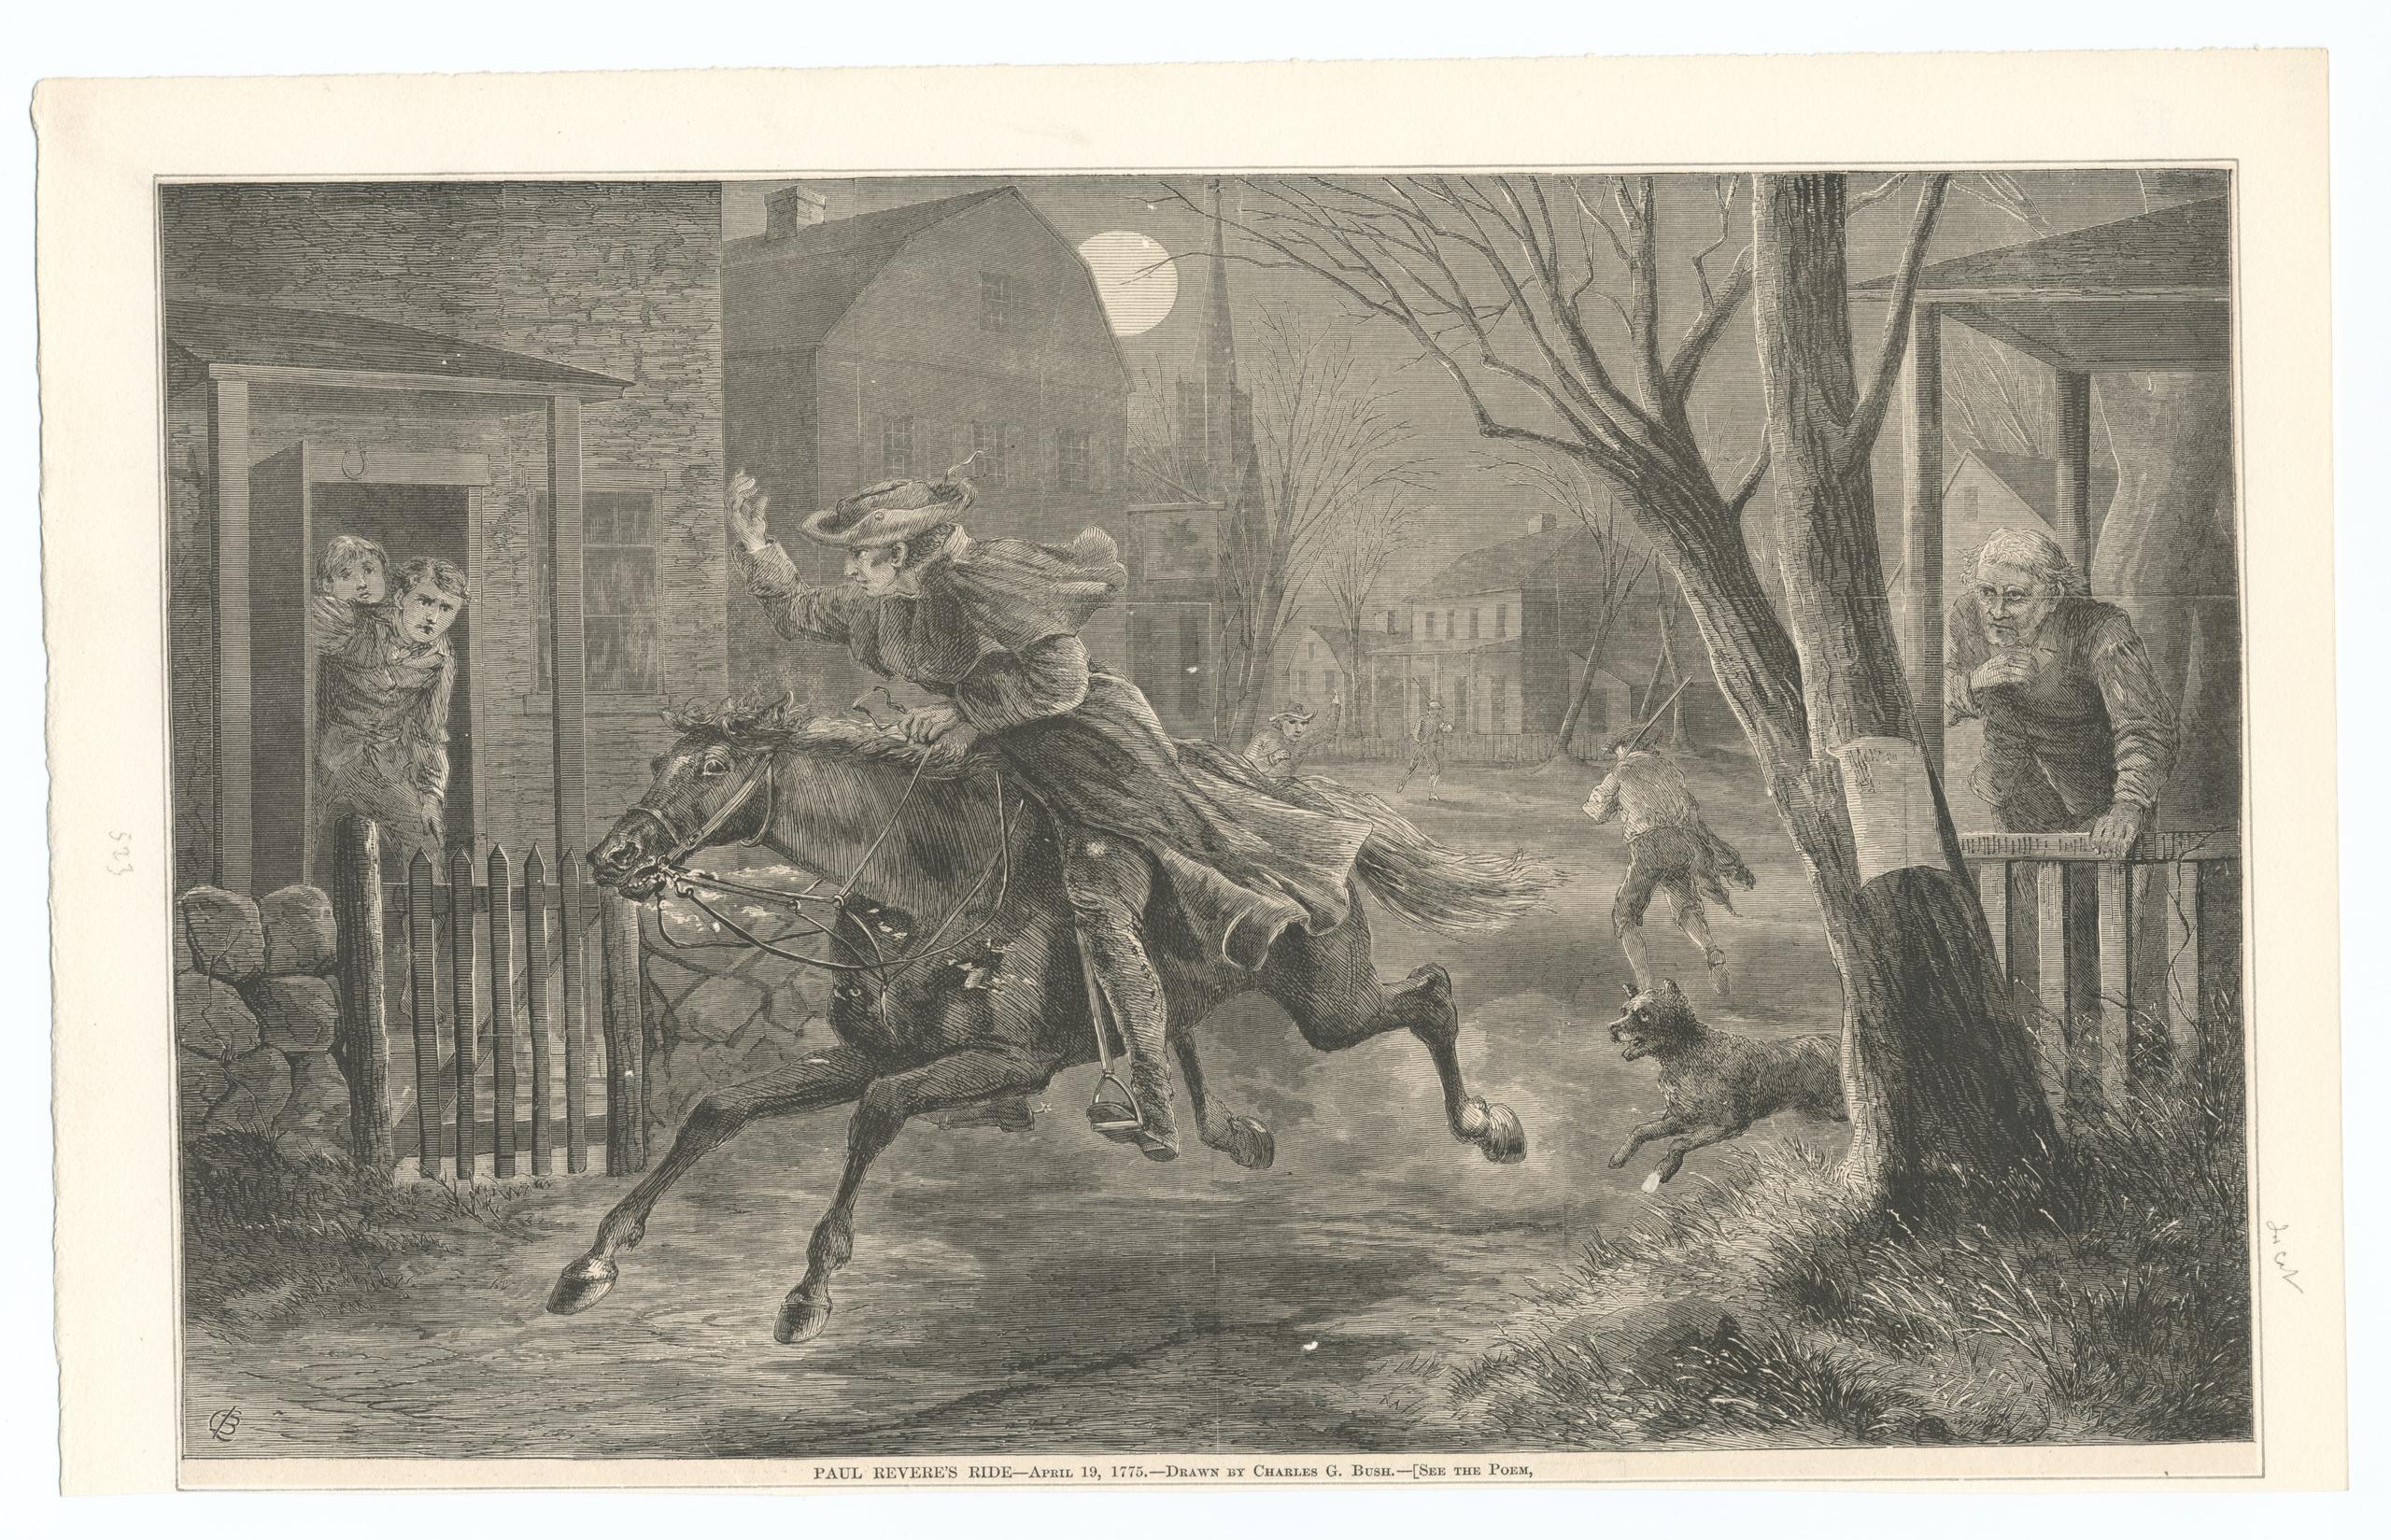 Famous Historic Art Reprint MIDNIGHT RIDE OF PAUL REVERE Revolutionary War Hero